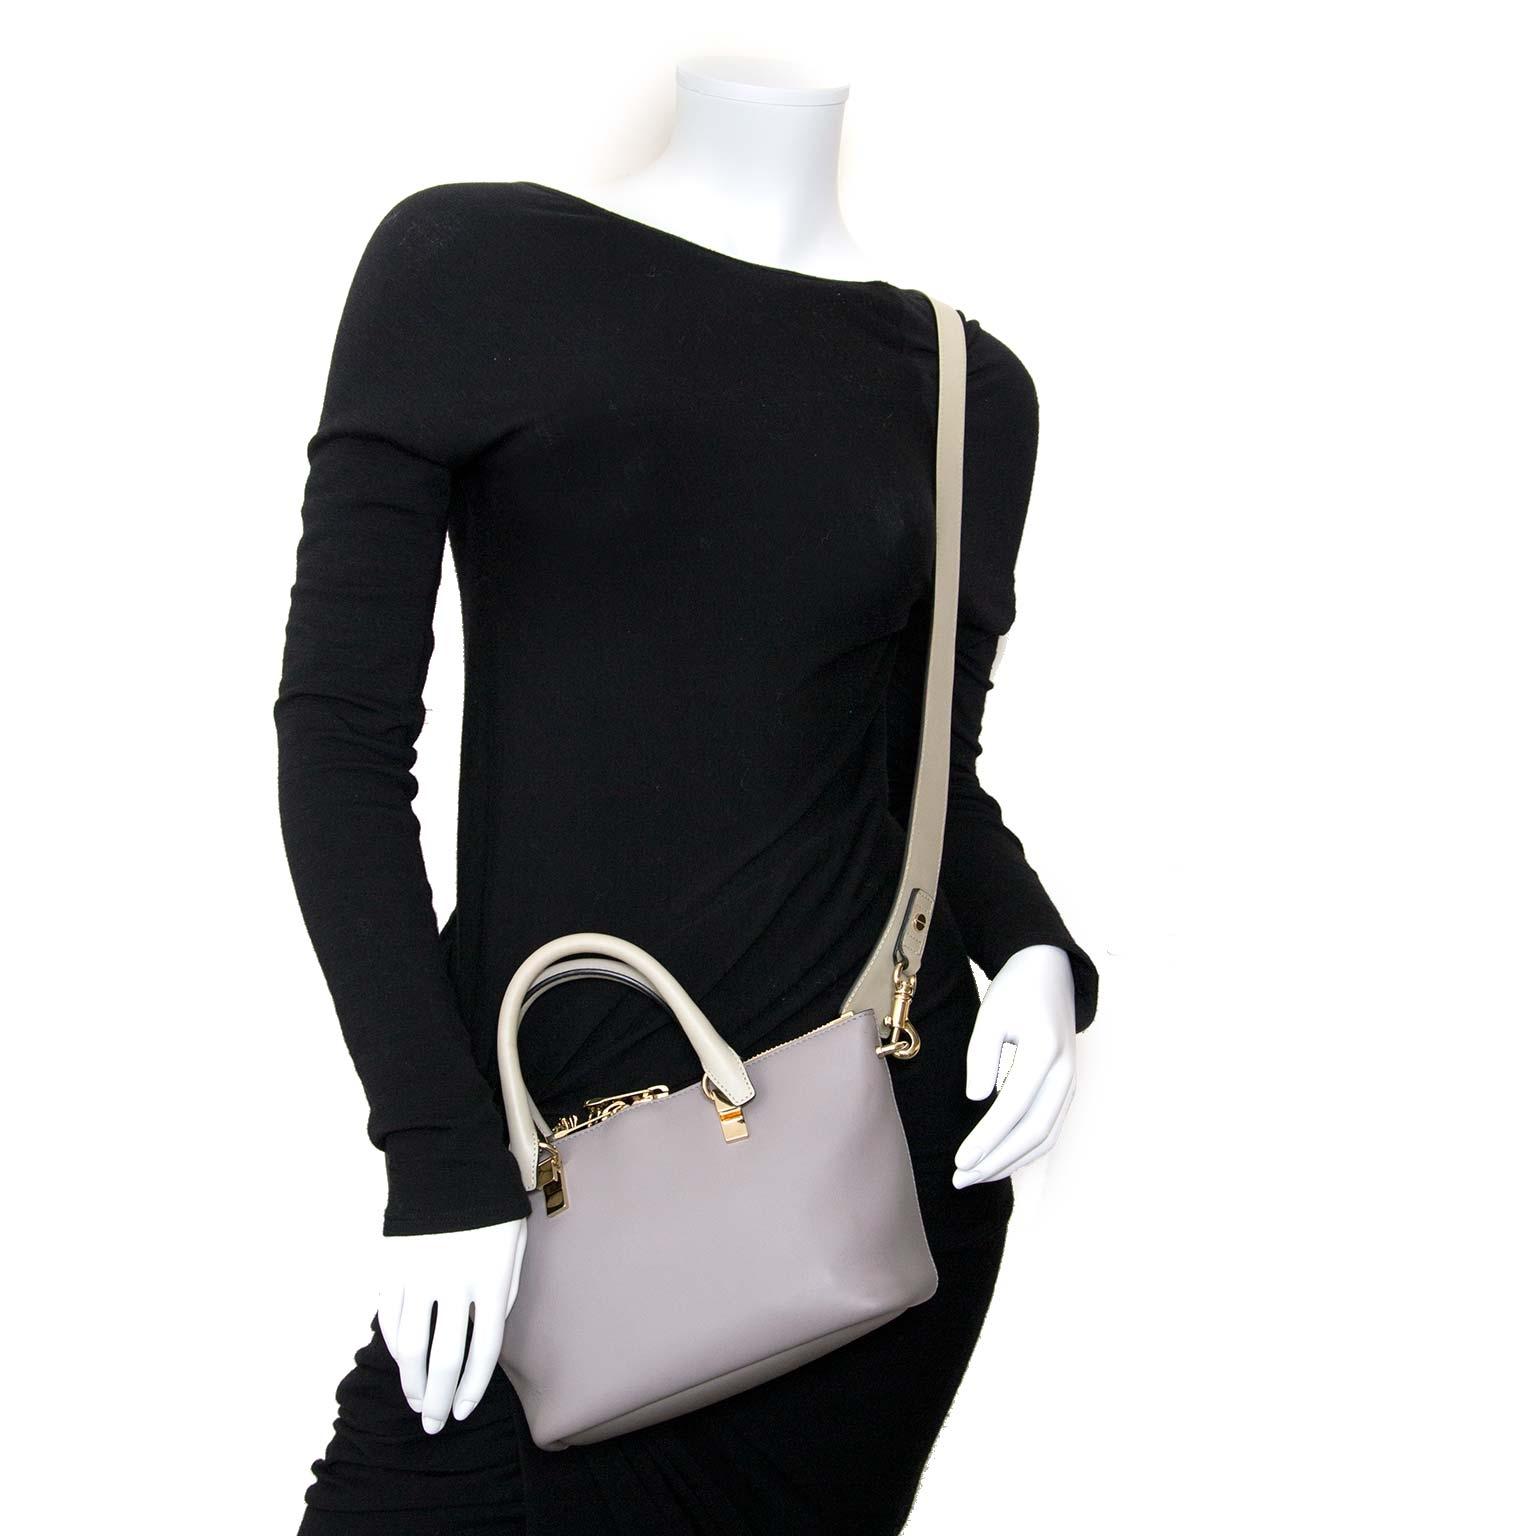 chloé mini grey baylee bag now for sale at labellov vintage fashion webshop belgium